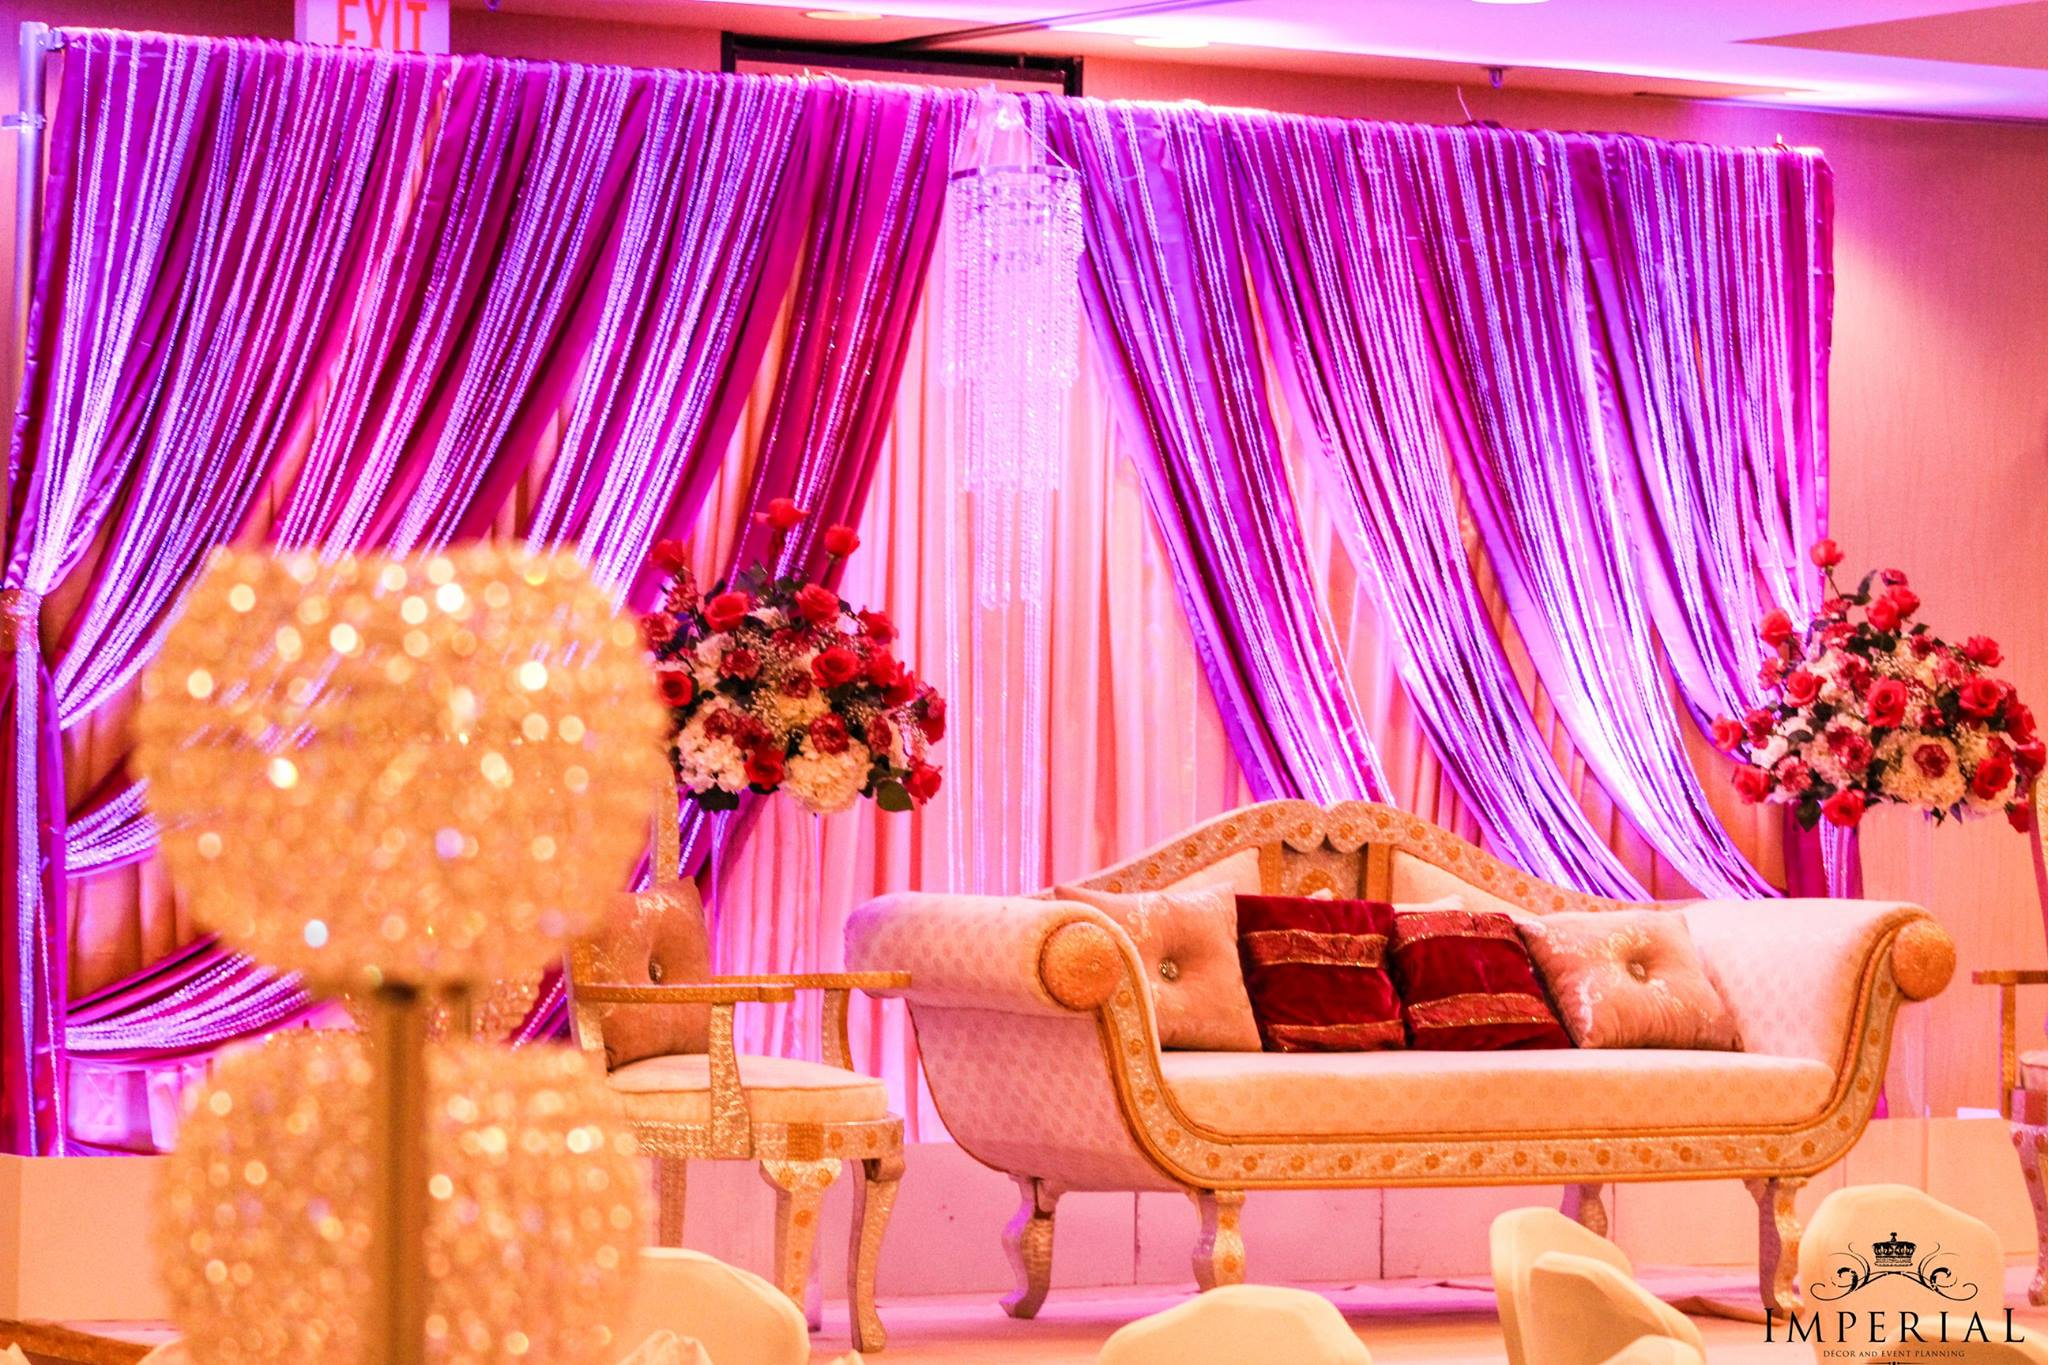 Imperial Decorations - Indian Wedding Stage Decorations Washington DC.jpg